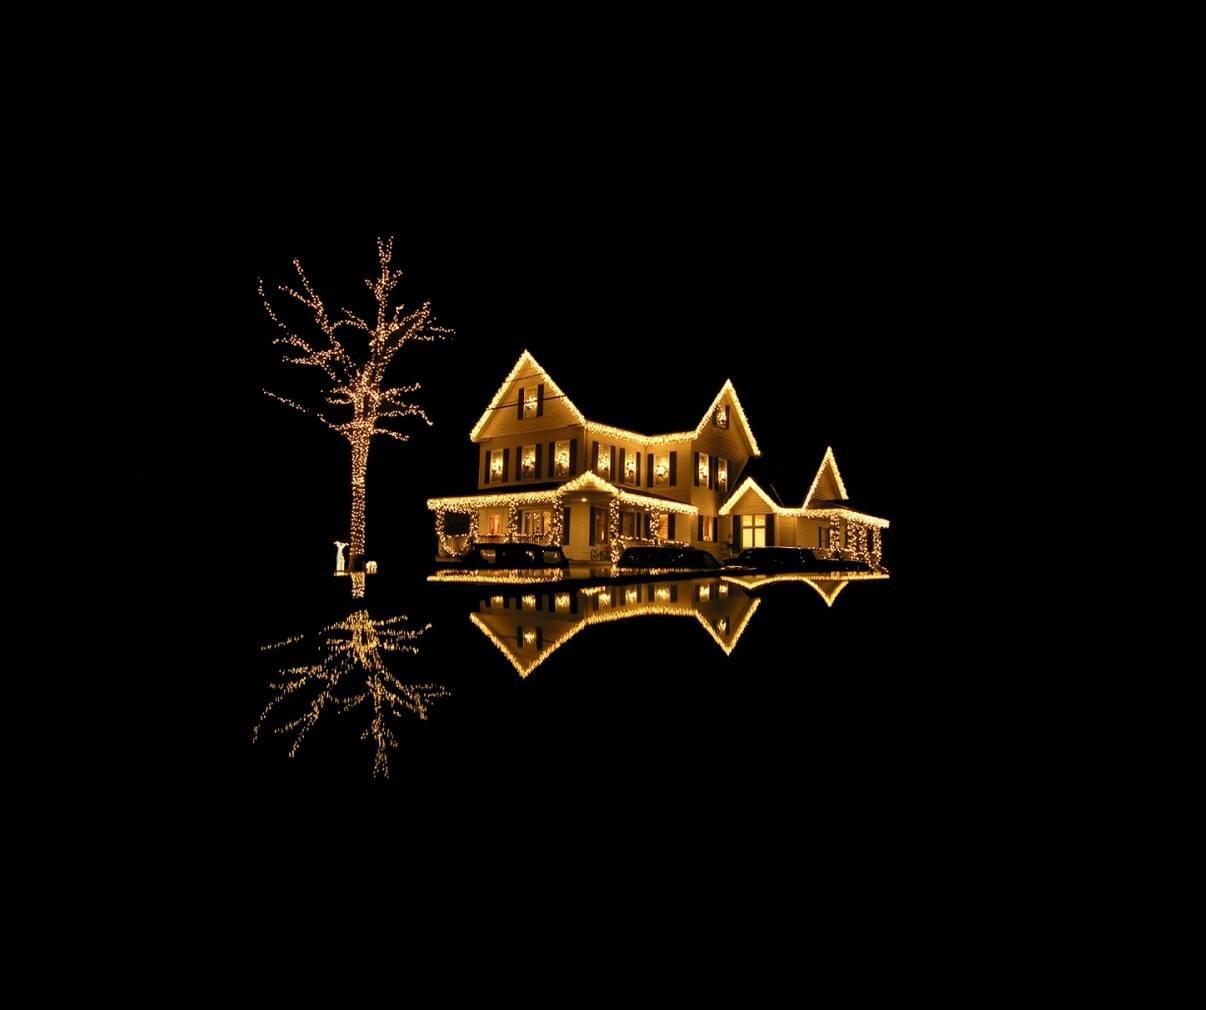 The Dark Home